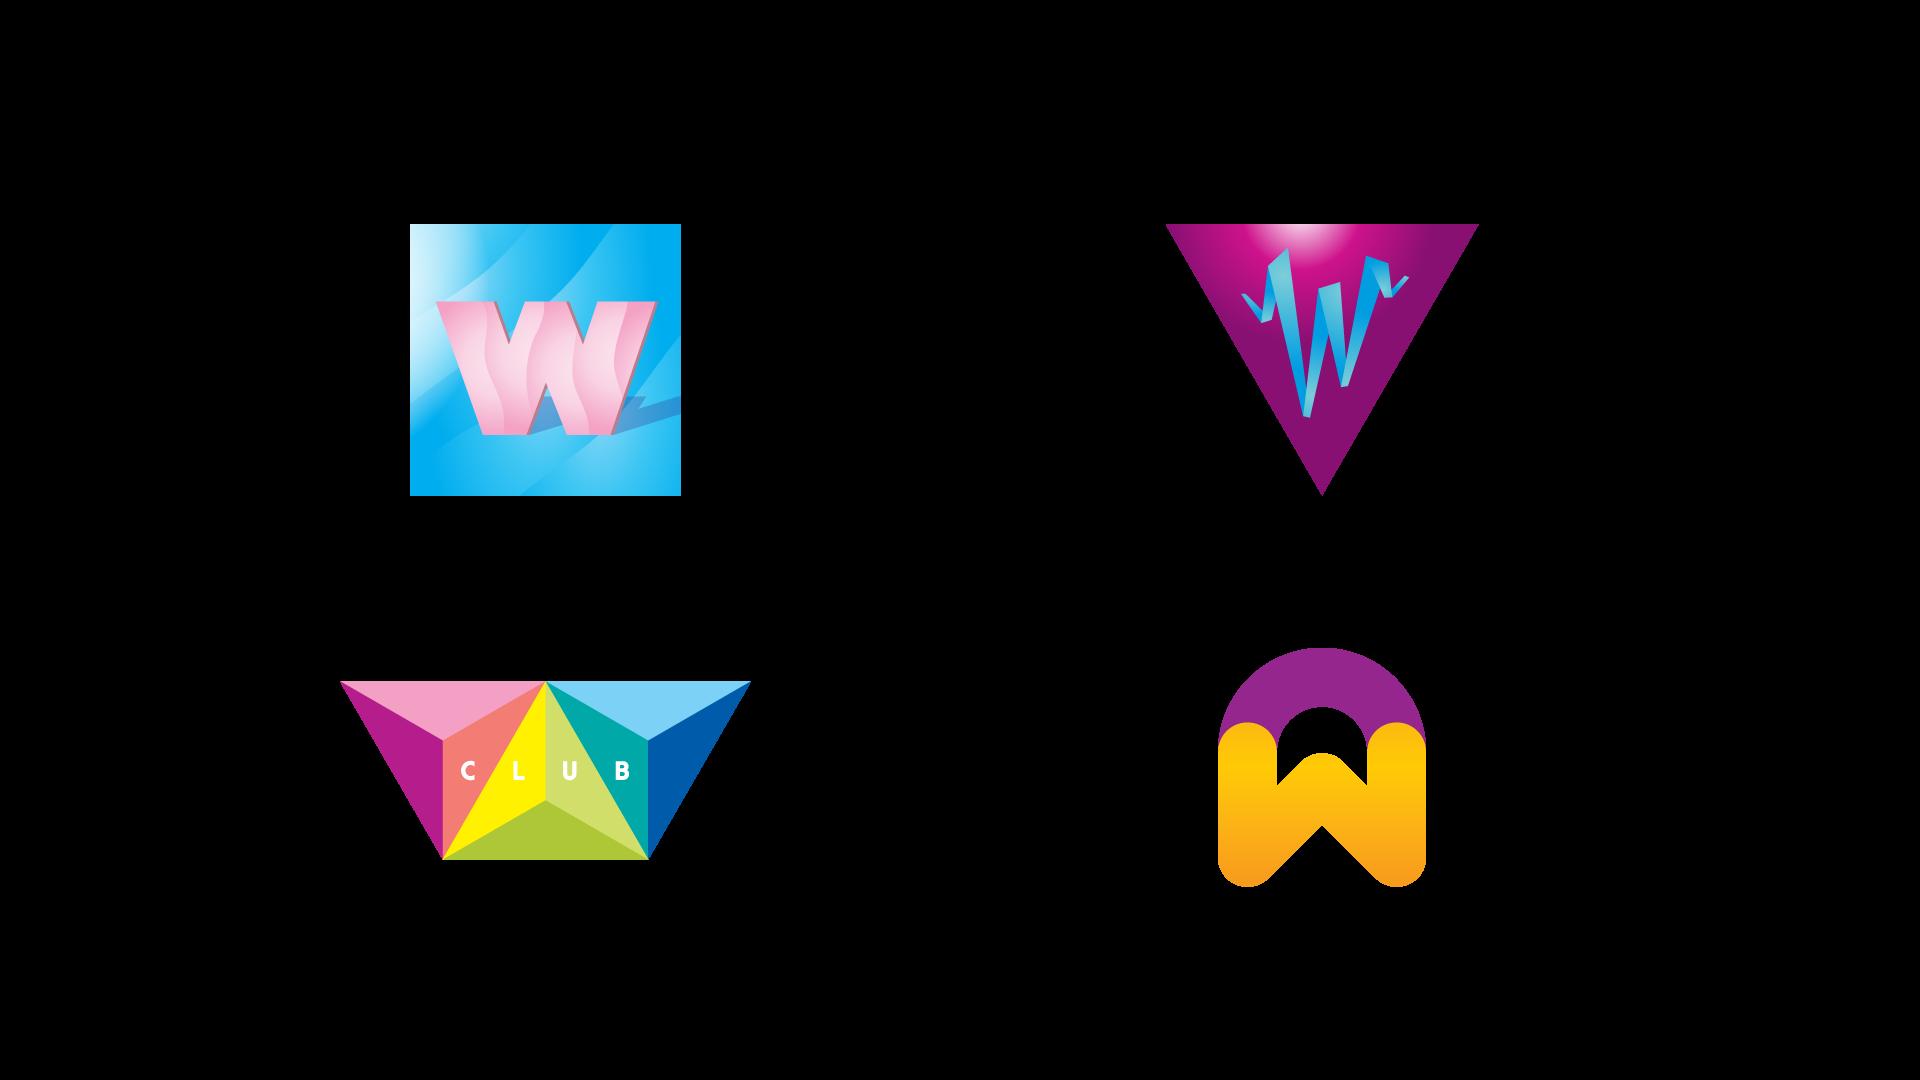 w-alternatives